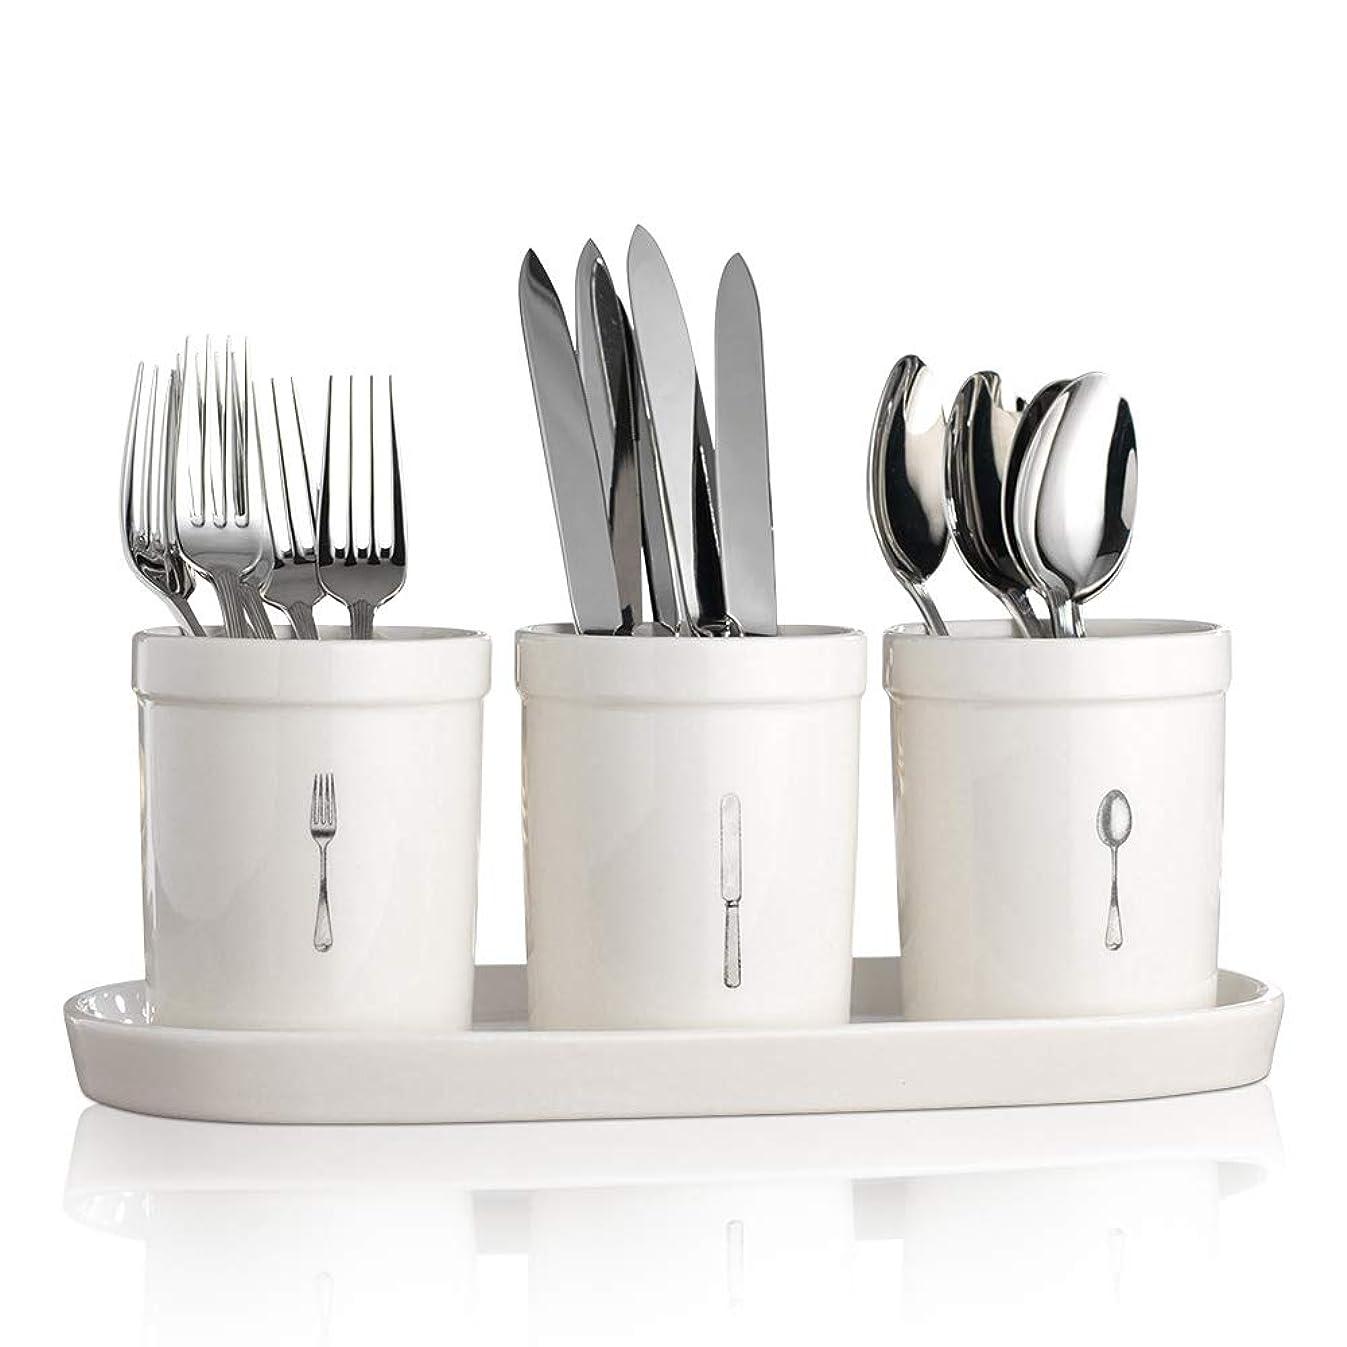 Emenest Flatware Organizer Set, 4-pc Ceramic Utensil Crocks on Tray - Printed Mugs on Stoneware Caddy - Home and Party Dinnerware Set